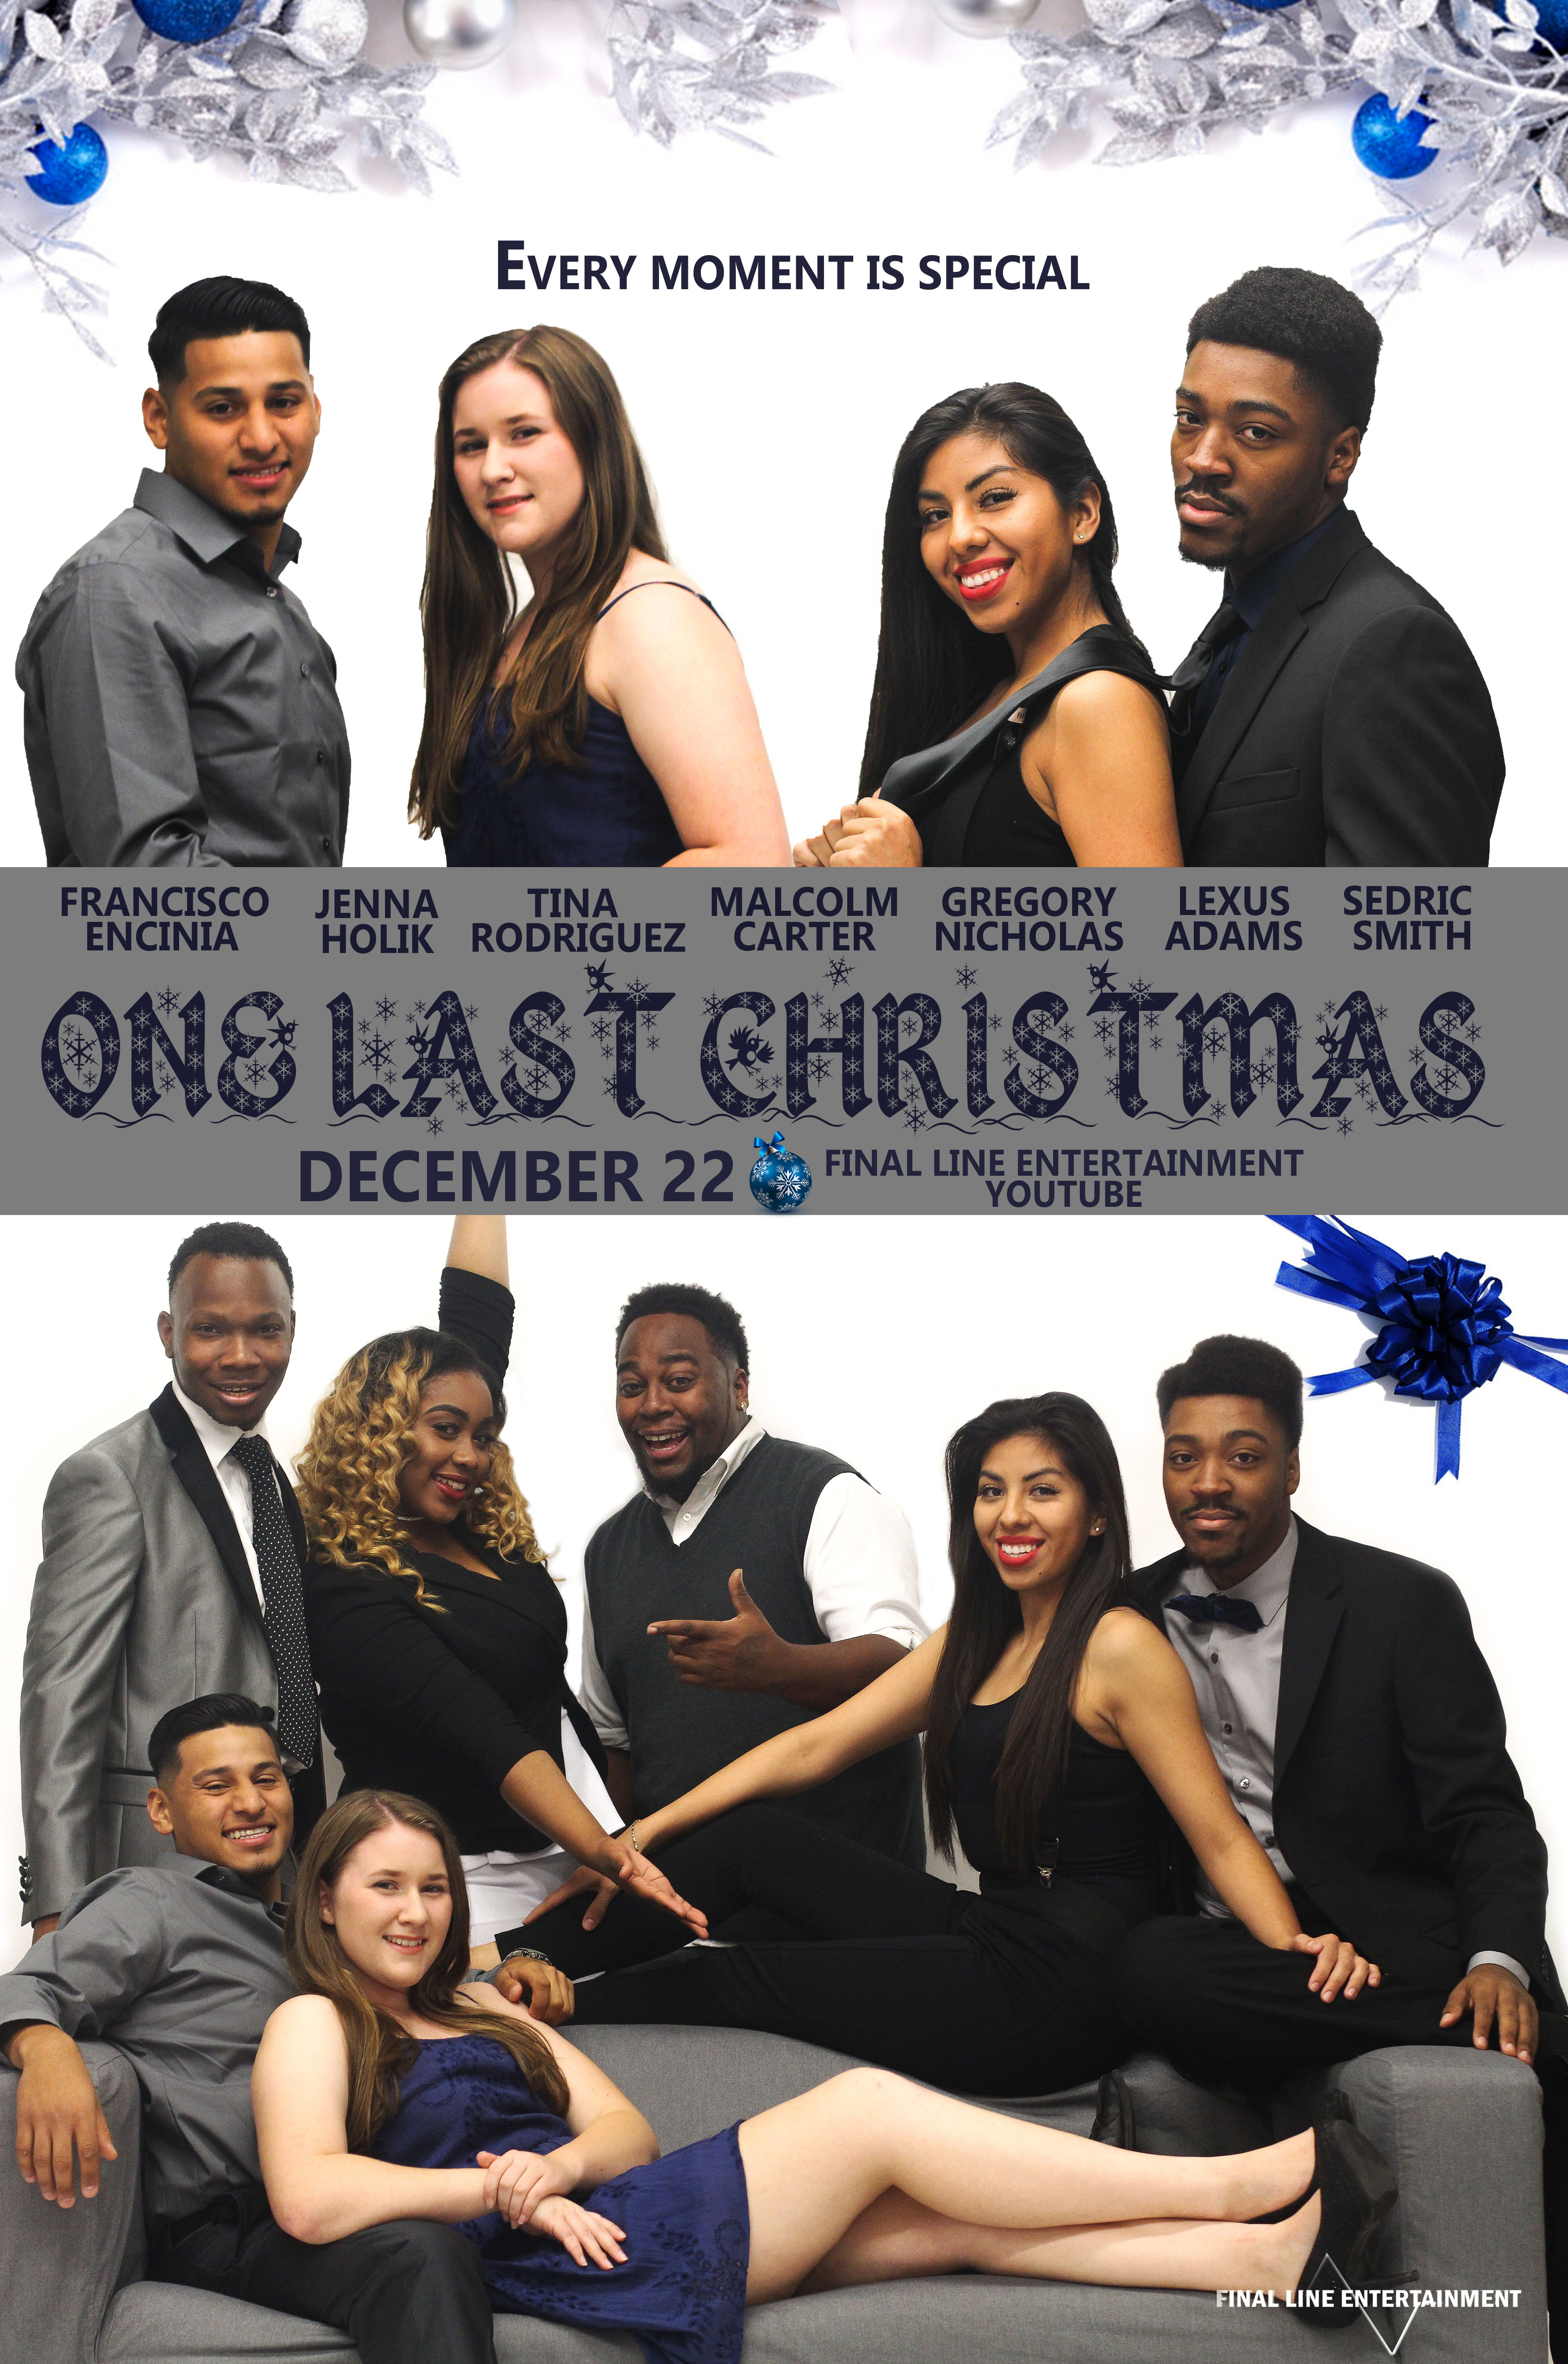 one last christmas 2016 imdb - Youtube Last Christmas